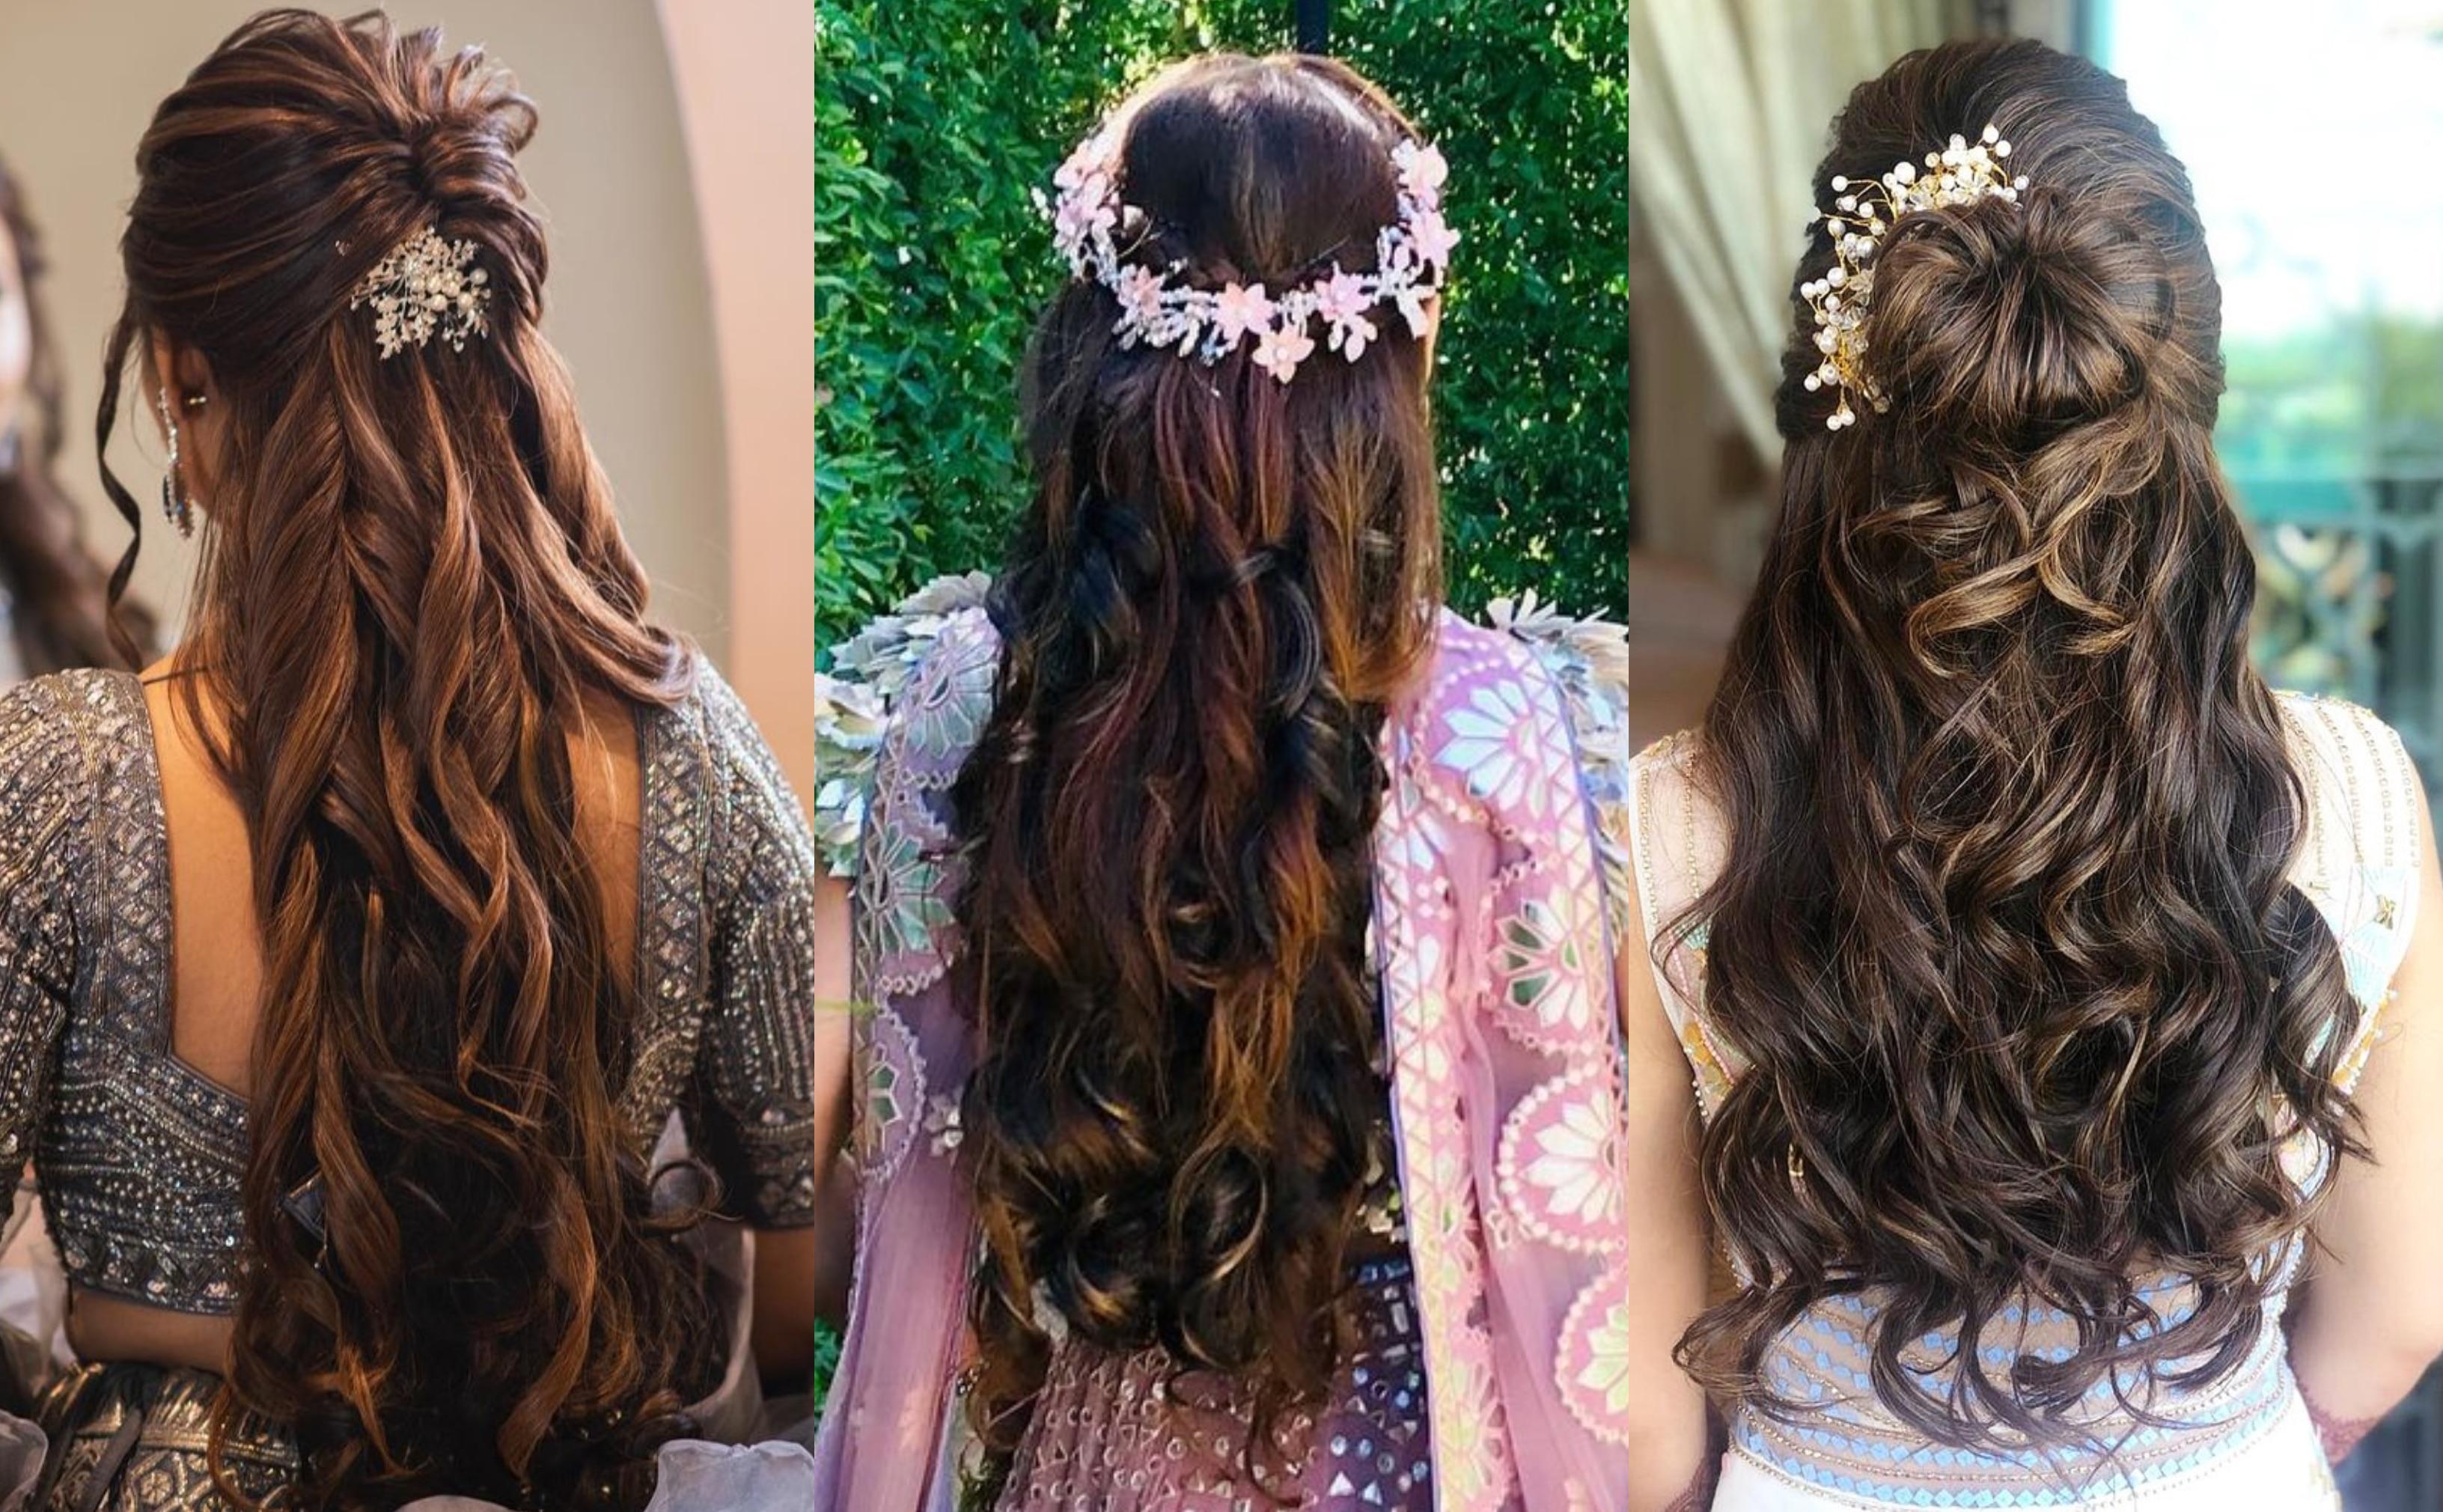 17 Trendiest Hairdos To Glam Up Your Wedding Reception Look Shaadisaga